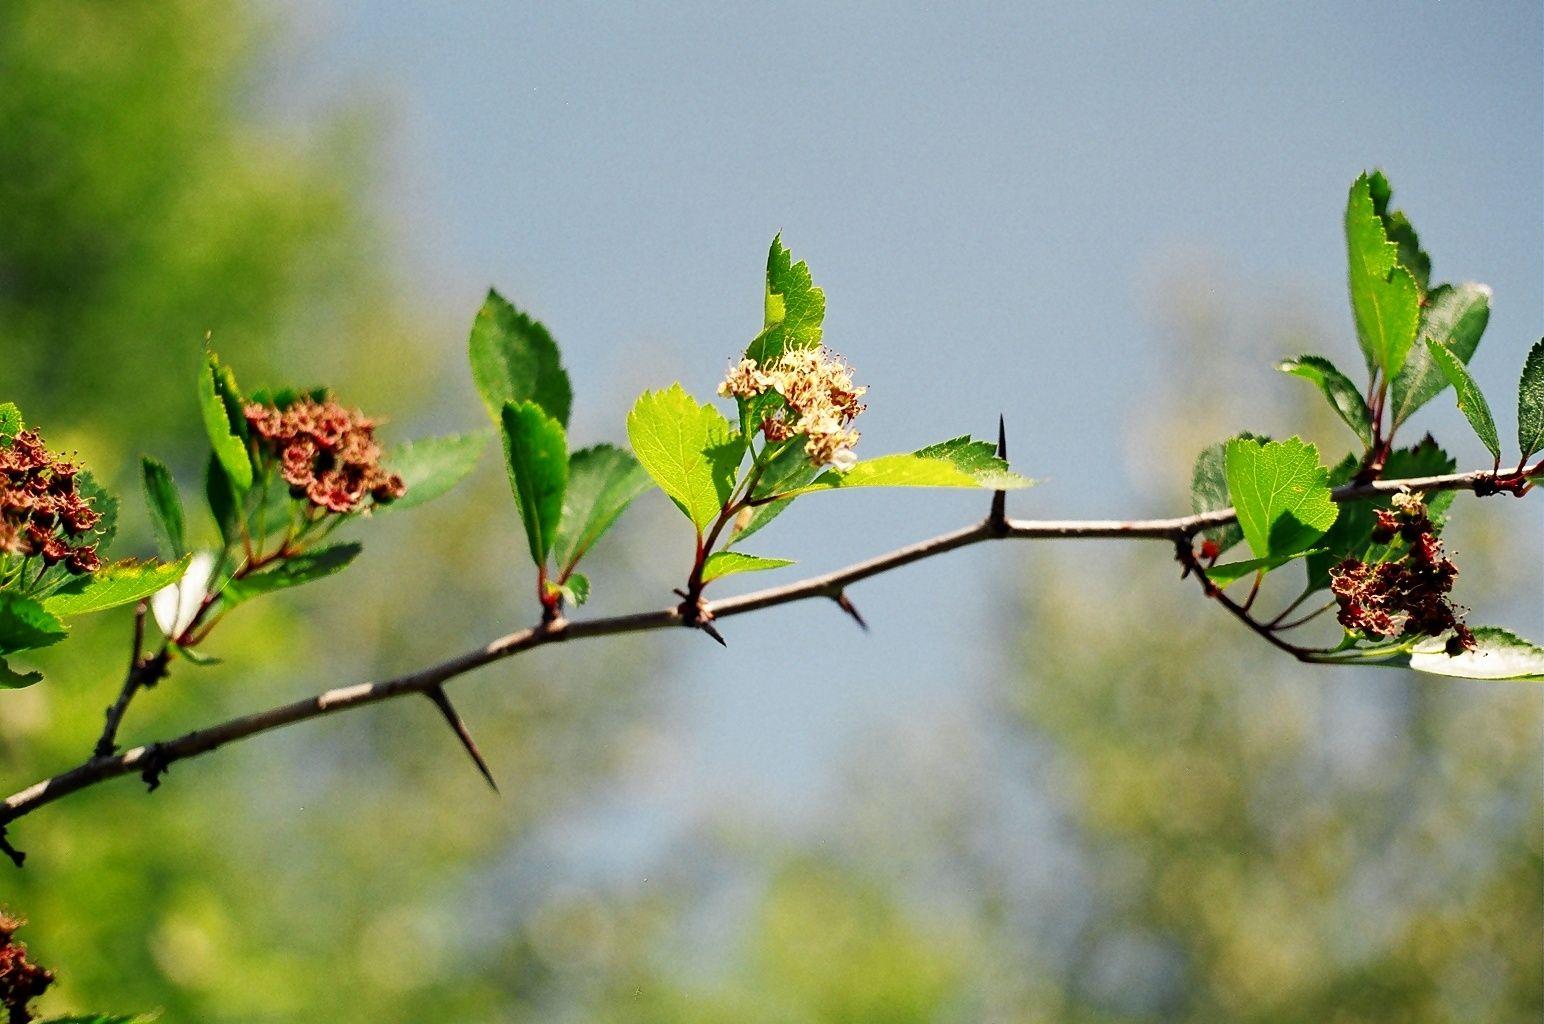 black hawthorn crataegus douglasii | ... & Gozo - Plant: Crataegus monogyna (Hawthorn) - (800x1033 - 191kB